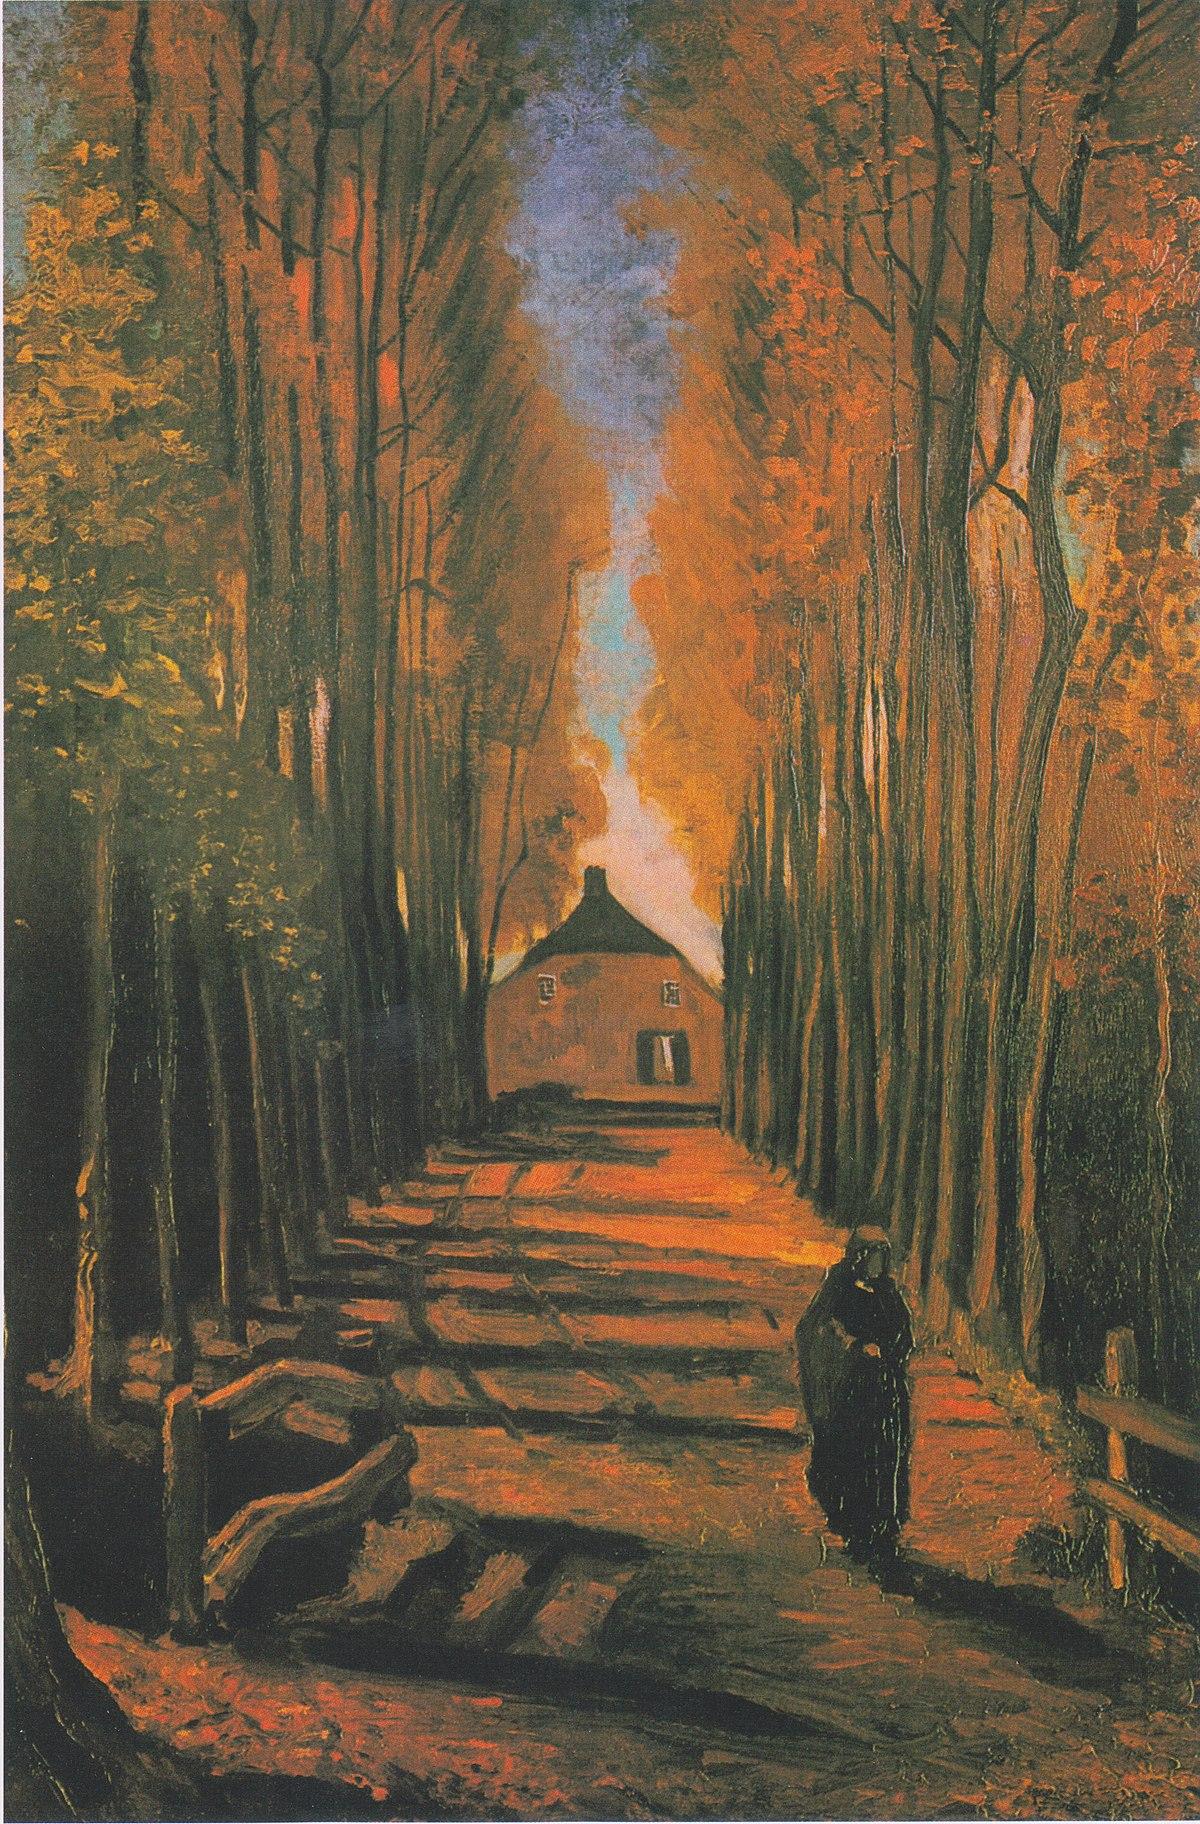 Avenue of Poplars in Autumn - Wikipedia